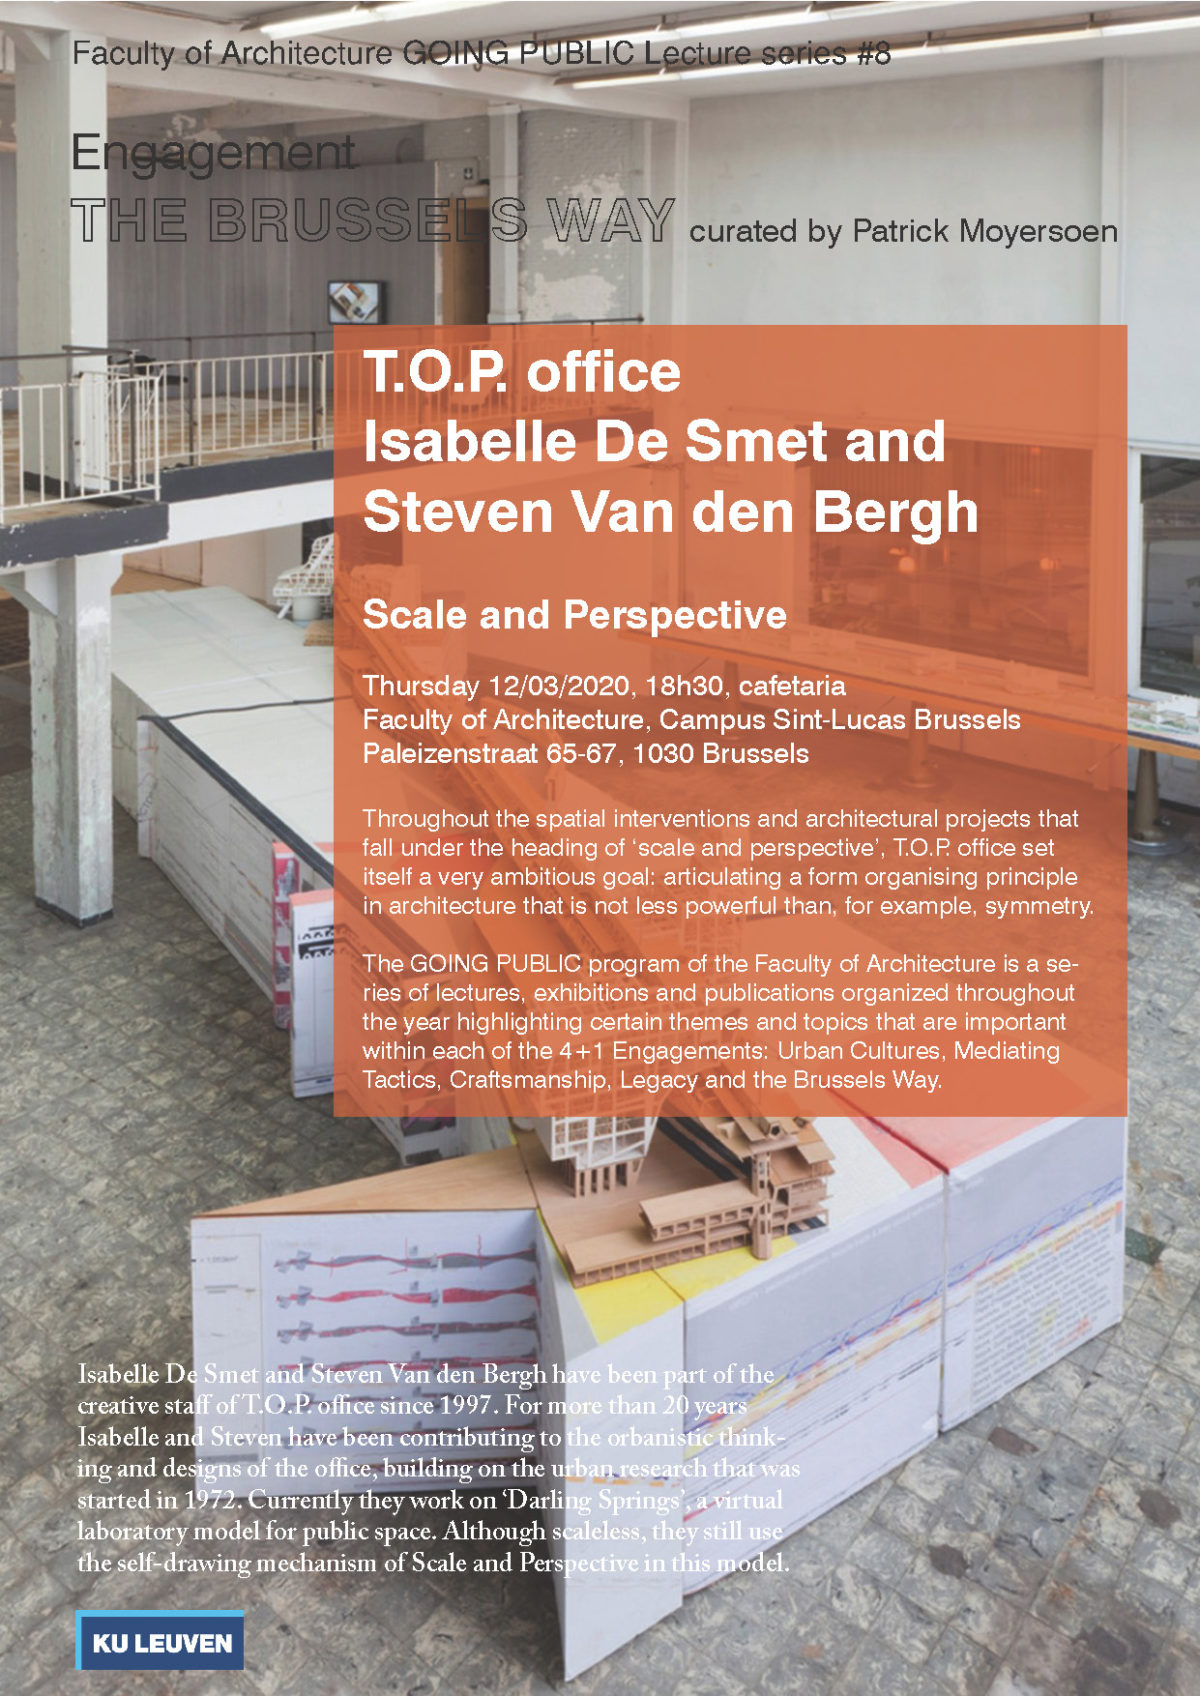 going-public-6-desmet-vandenbergh-new-pdf